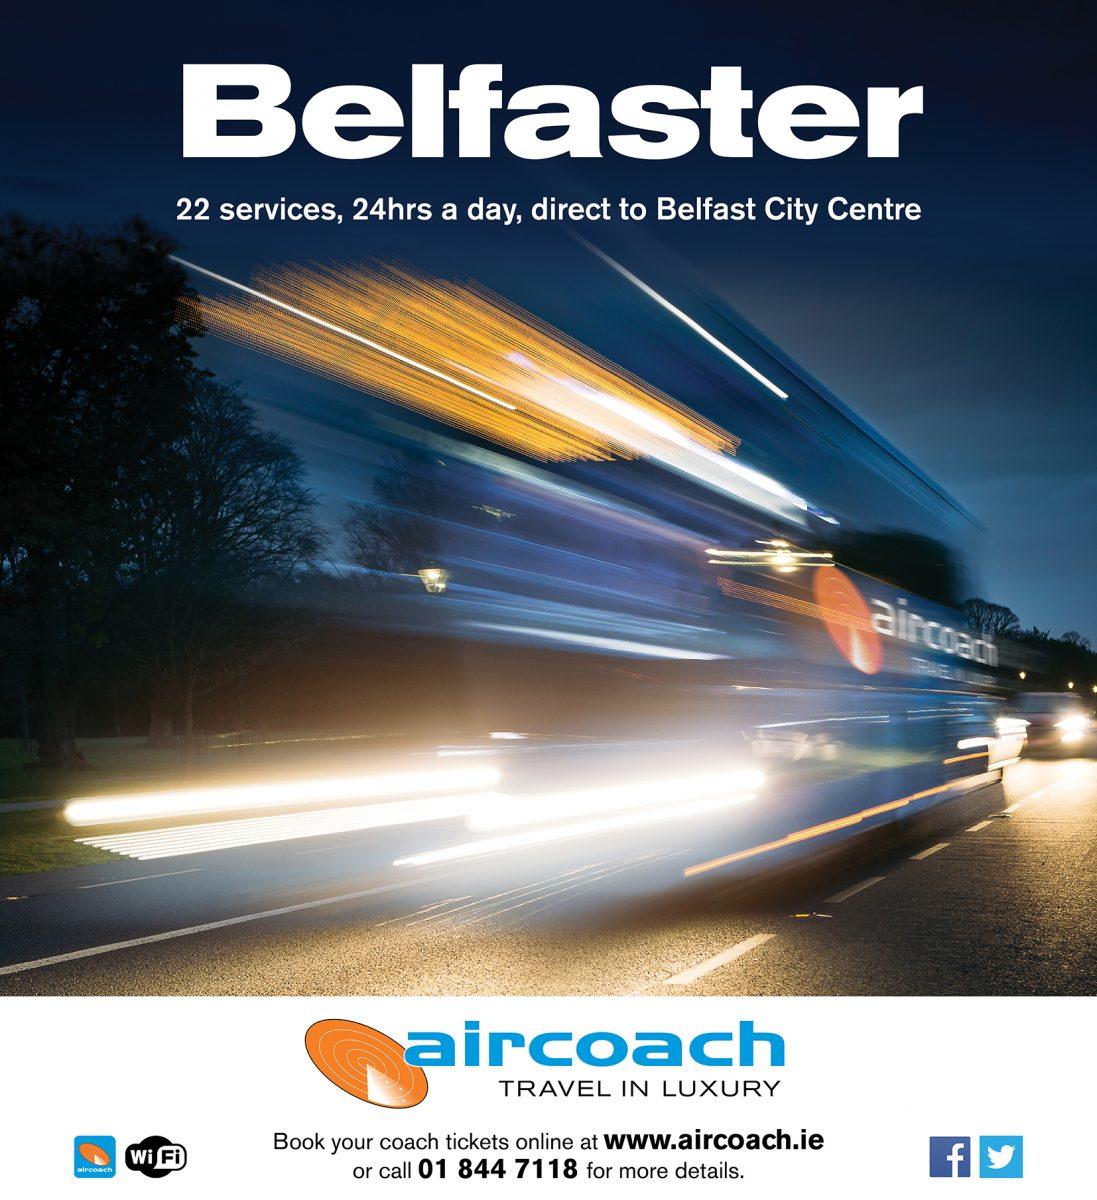 Marketing Network - Aircoach Belfast